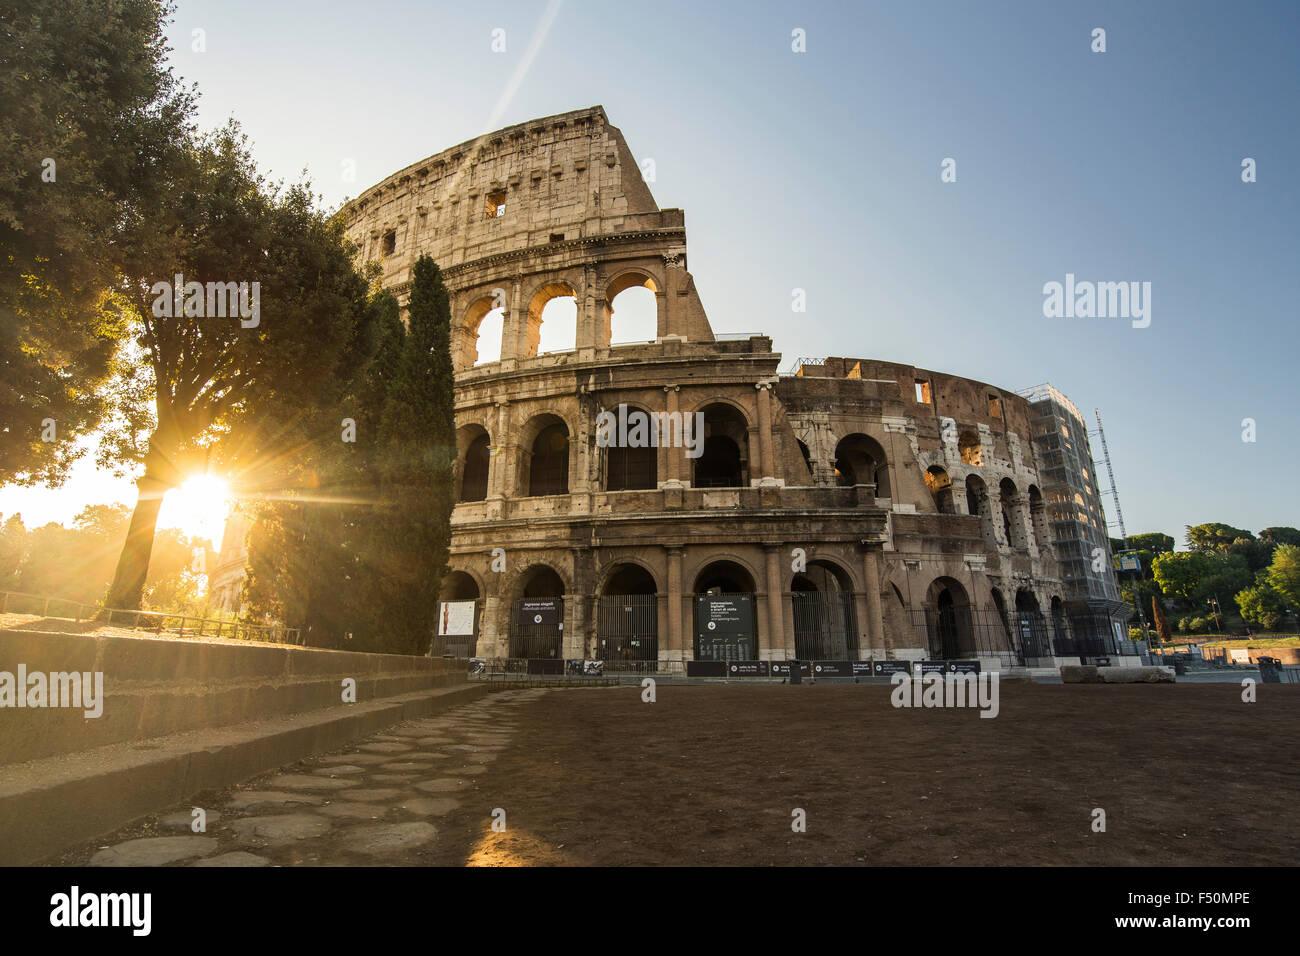 Coliseum in Rome at sunrise - Stock Image